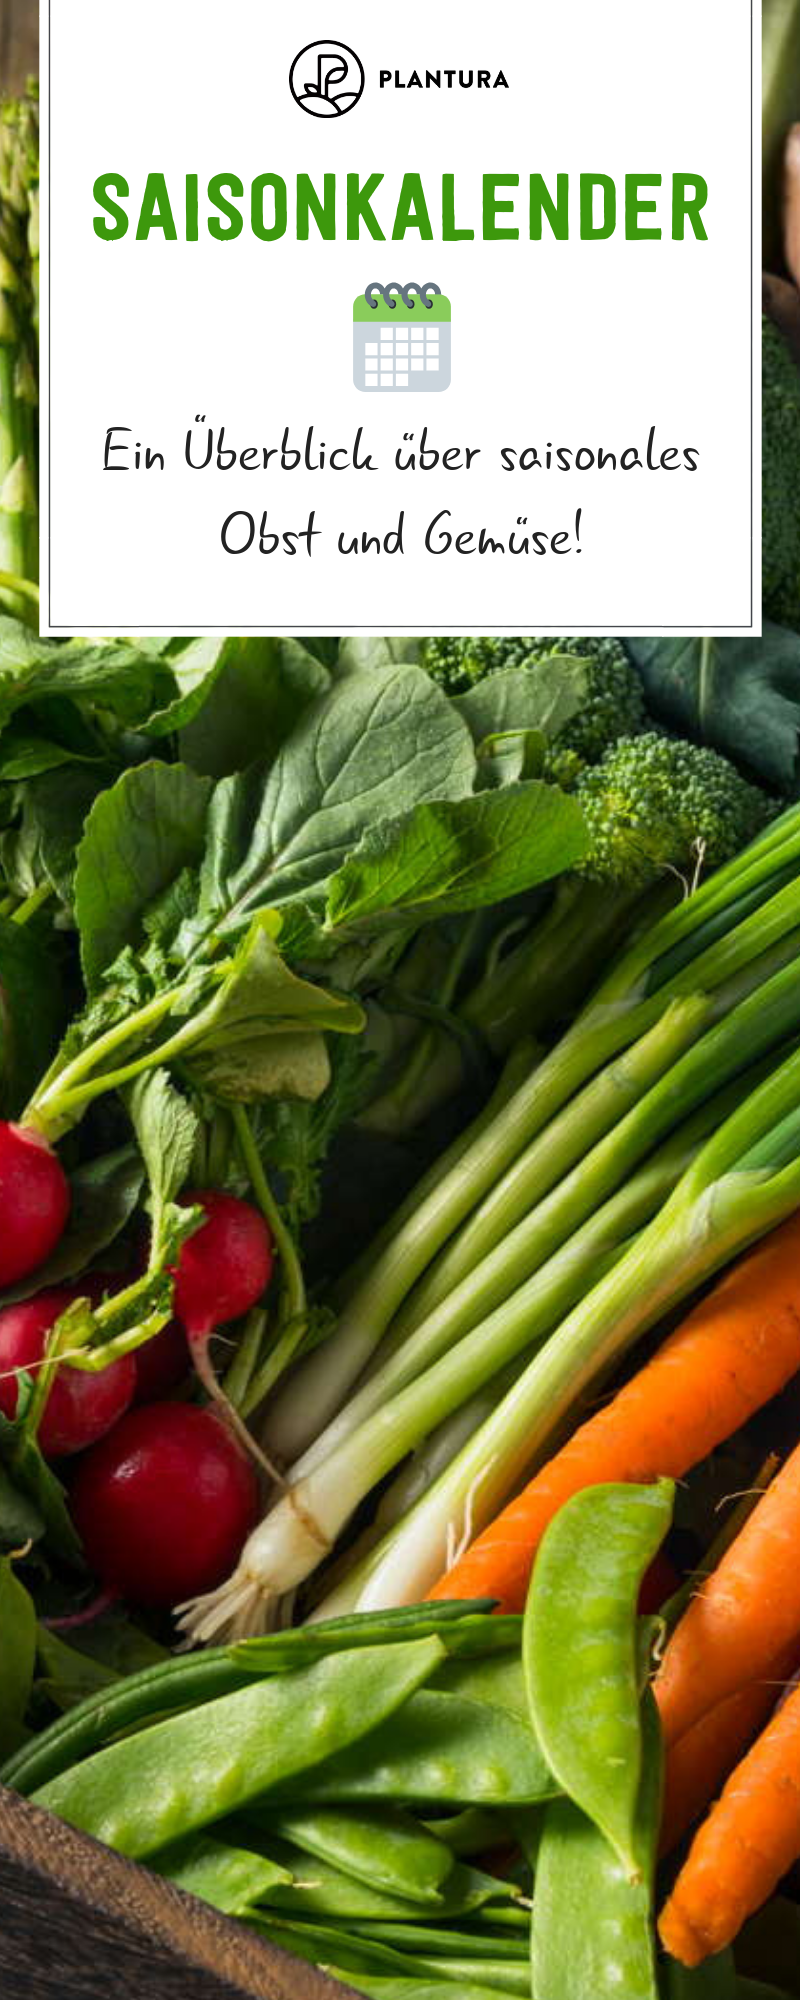 Saisonkalender: Wann wächst welches Gemüse & Obst #gemüsegartenanlegen